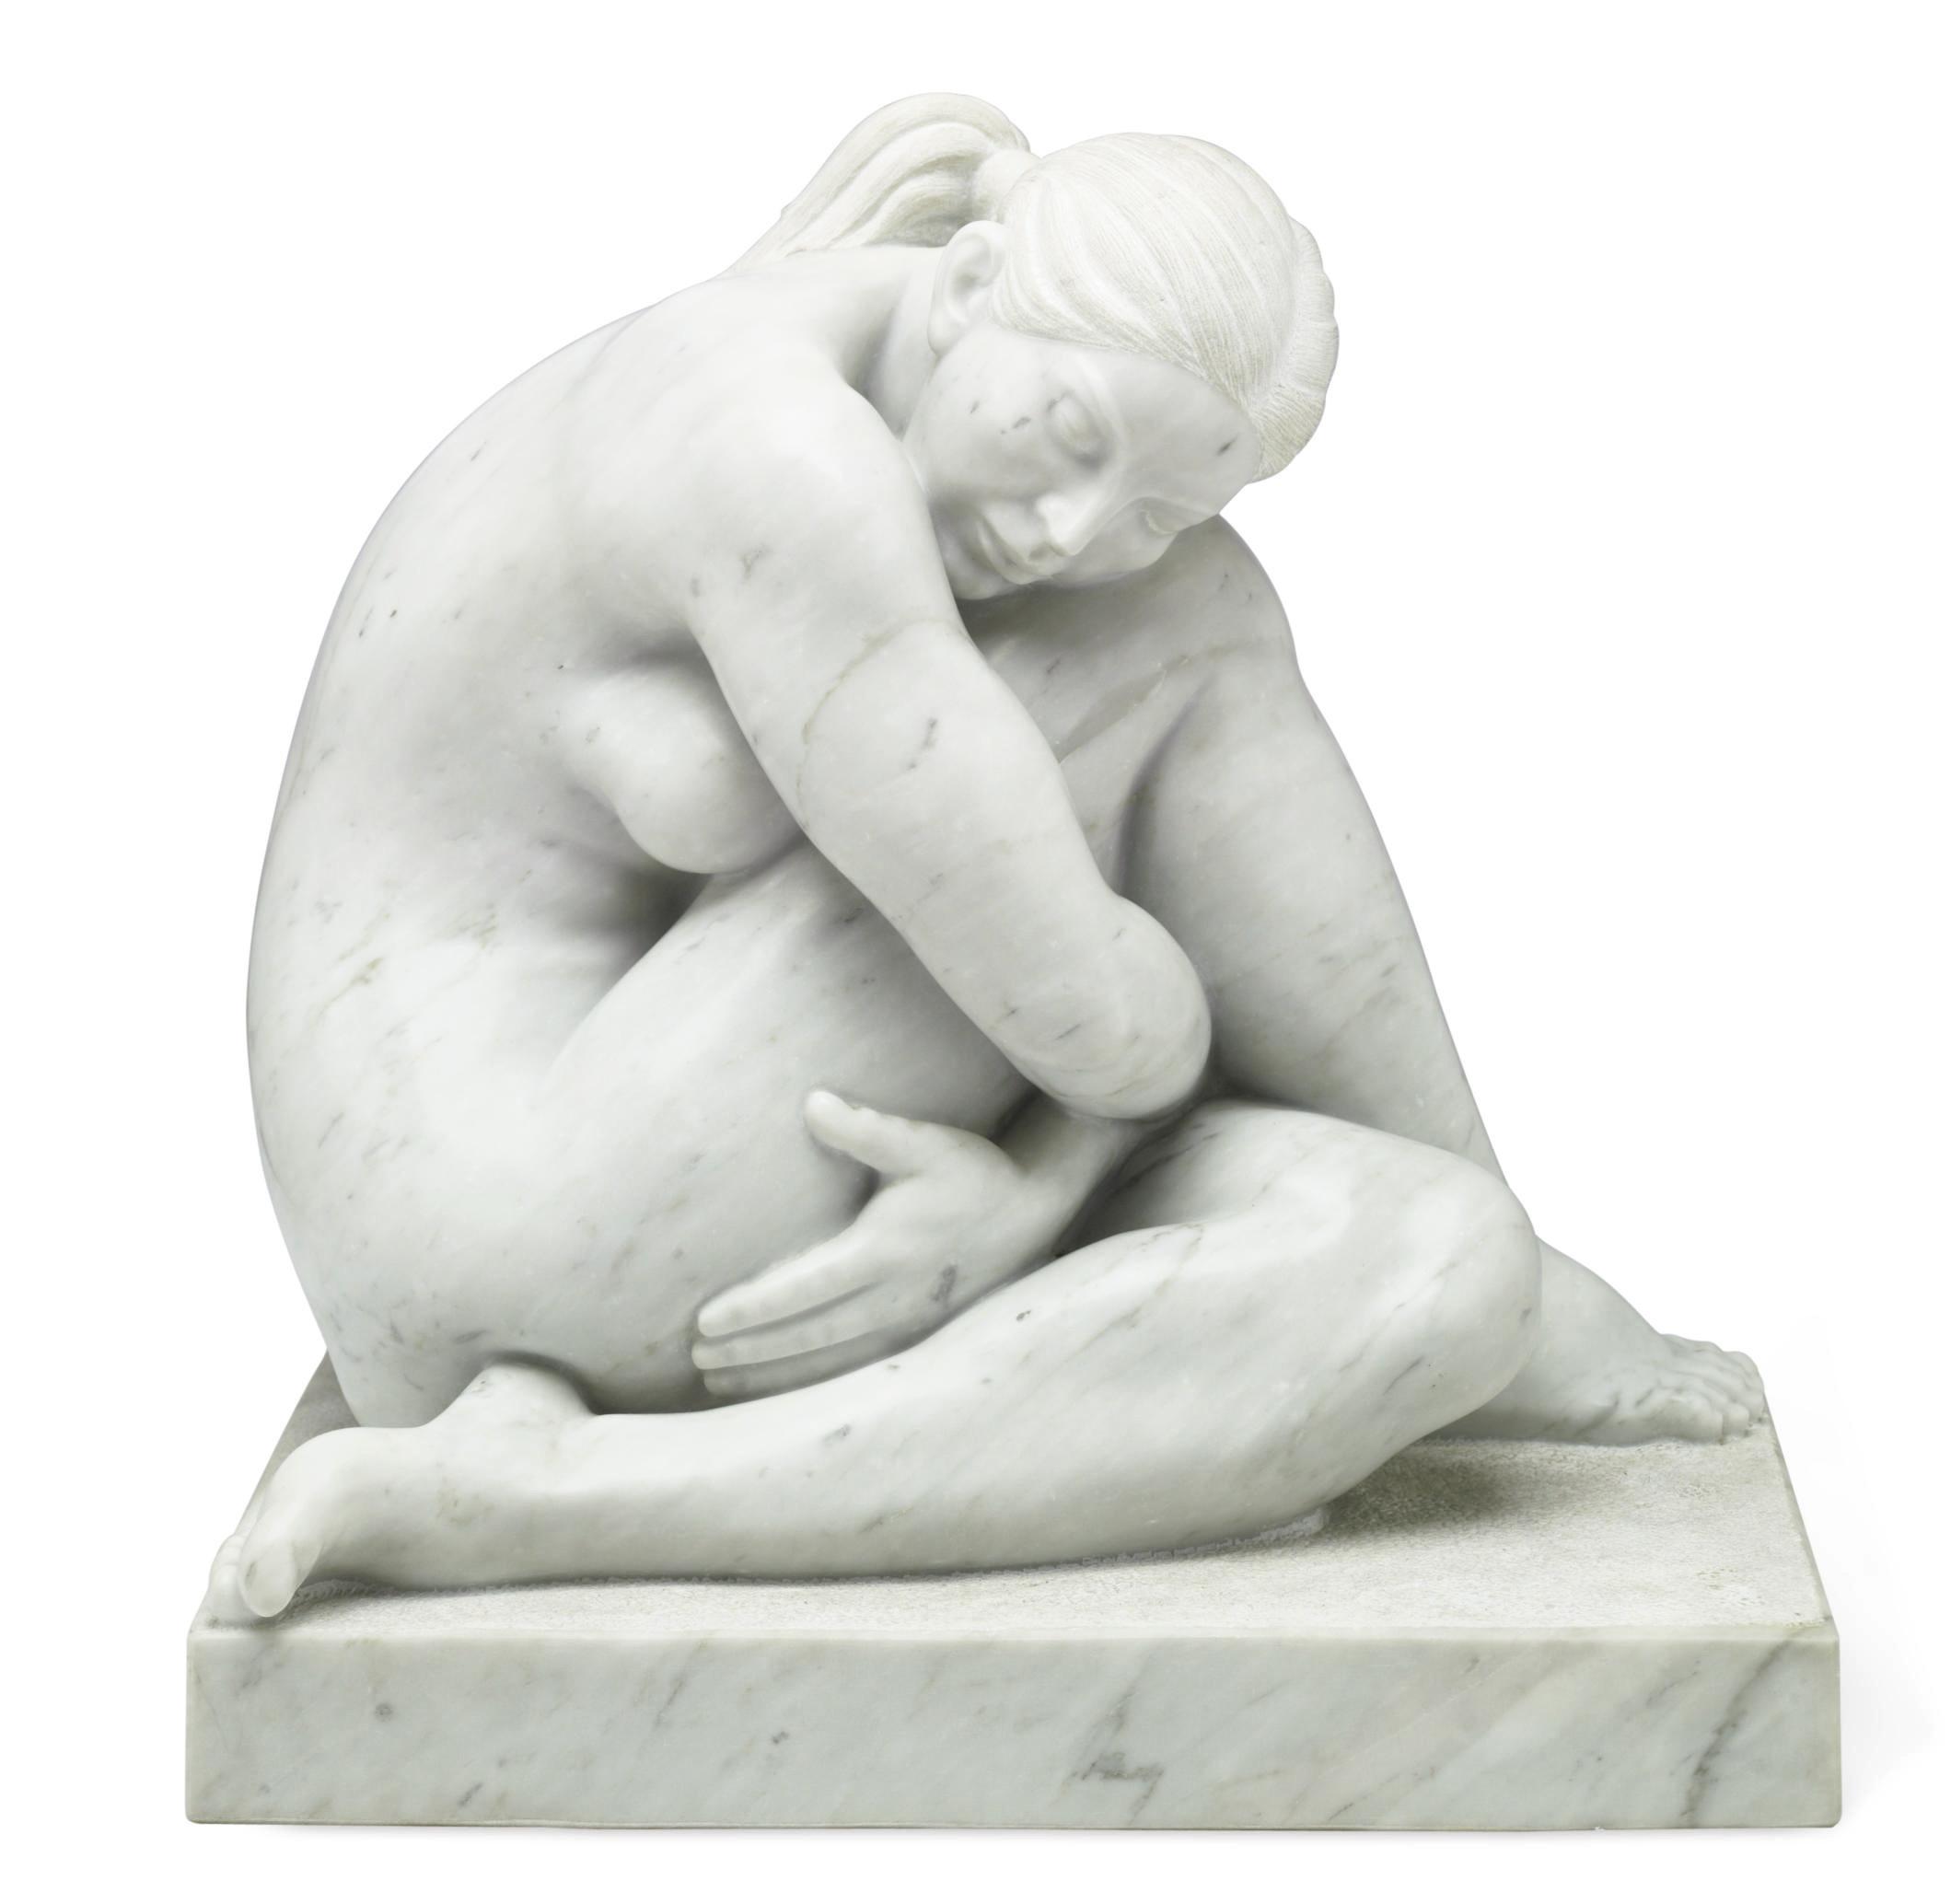 Untitled (Sitting Nude)